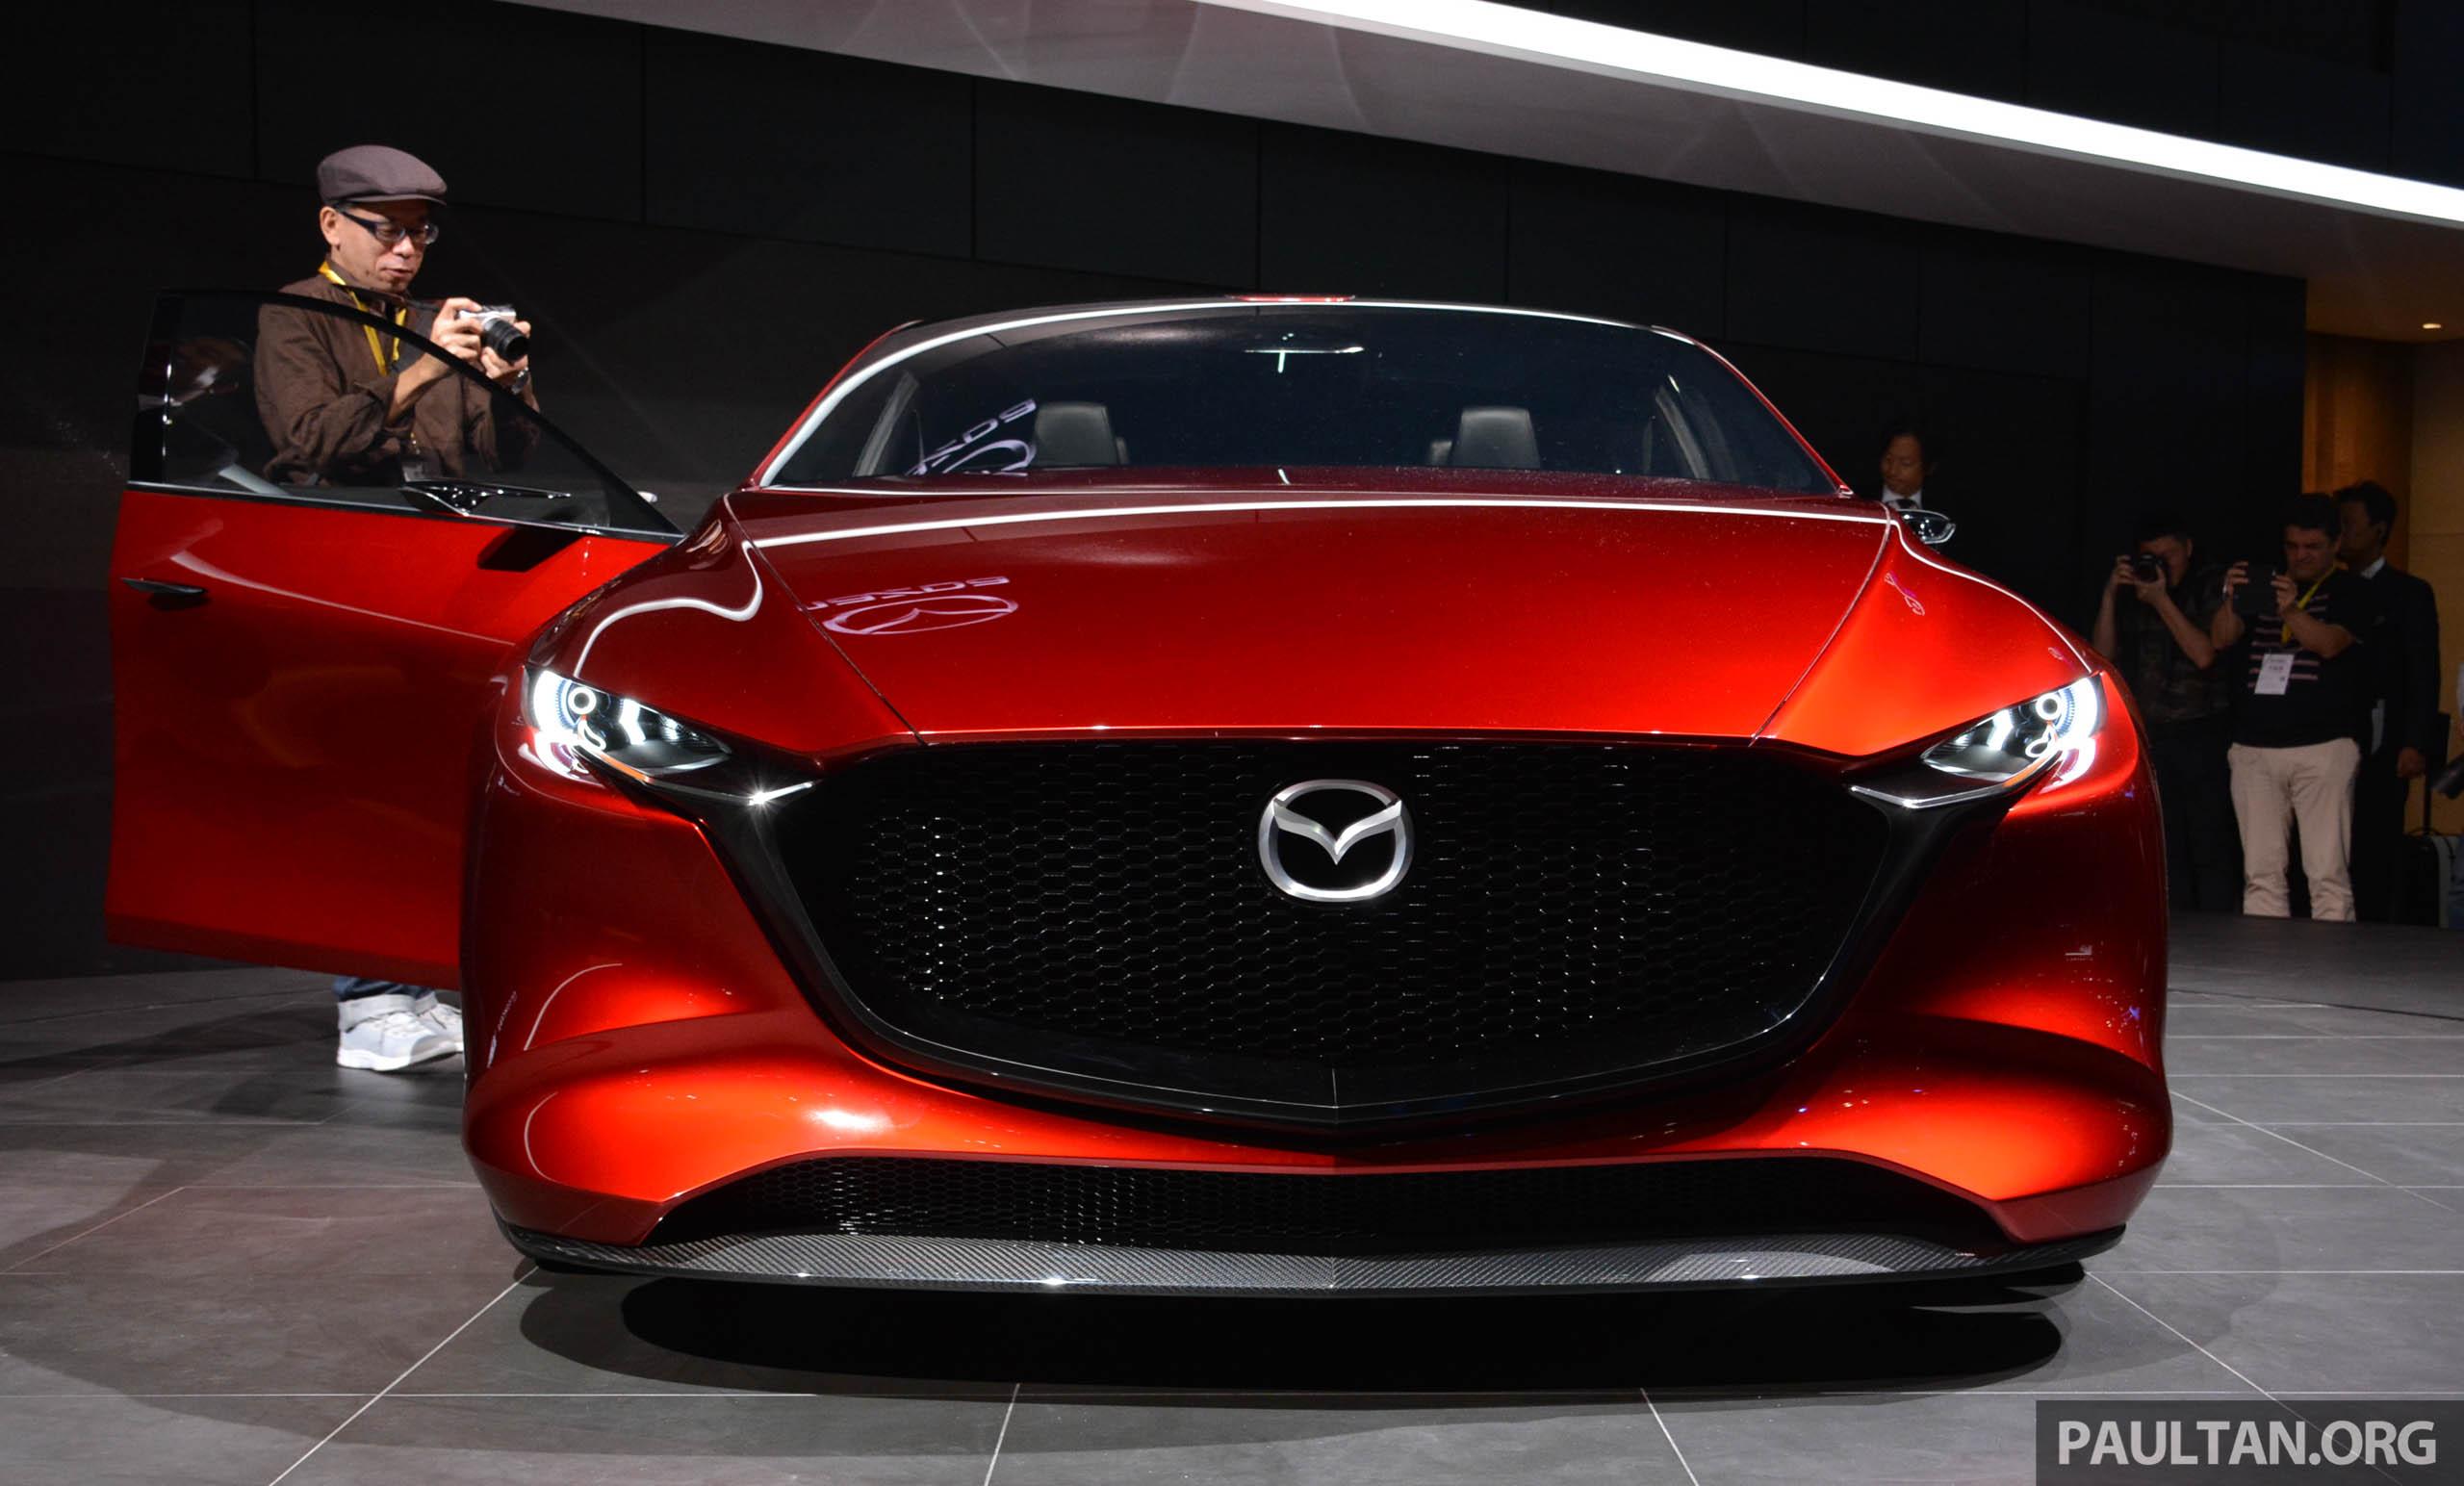 https://s1.paultan.org/image/2017/10/Mazda-Kai-Concept-TMS2017-4.jpg